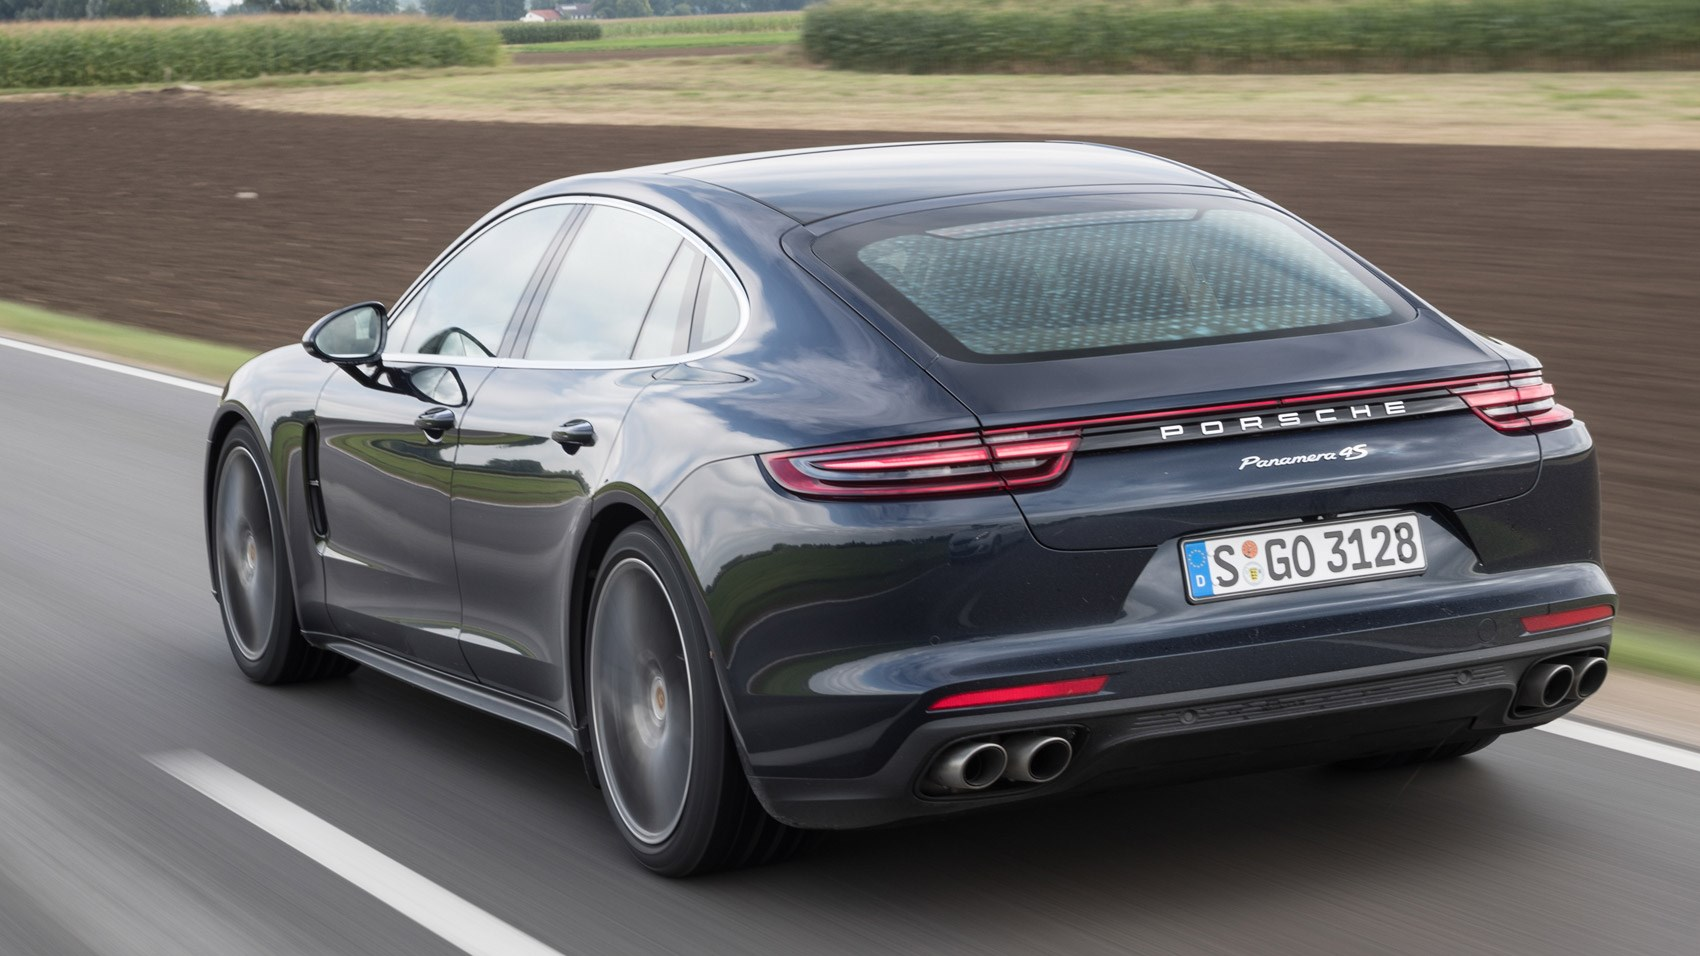 Porsche Panamera 4s Diesel 2016 Review Car Magazine